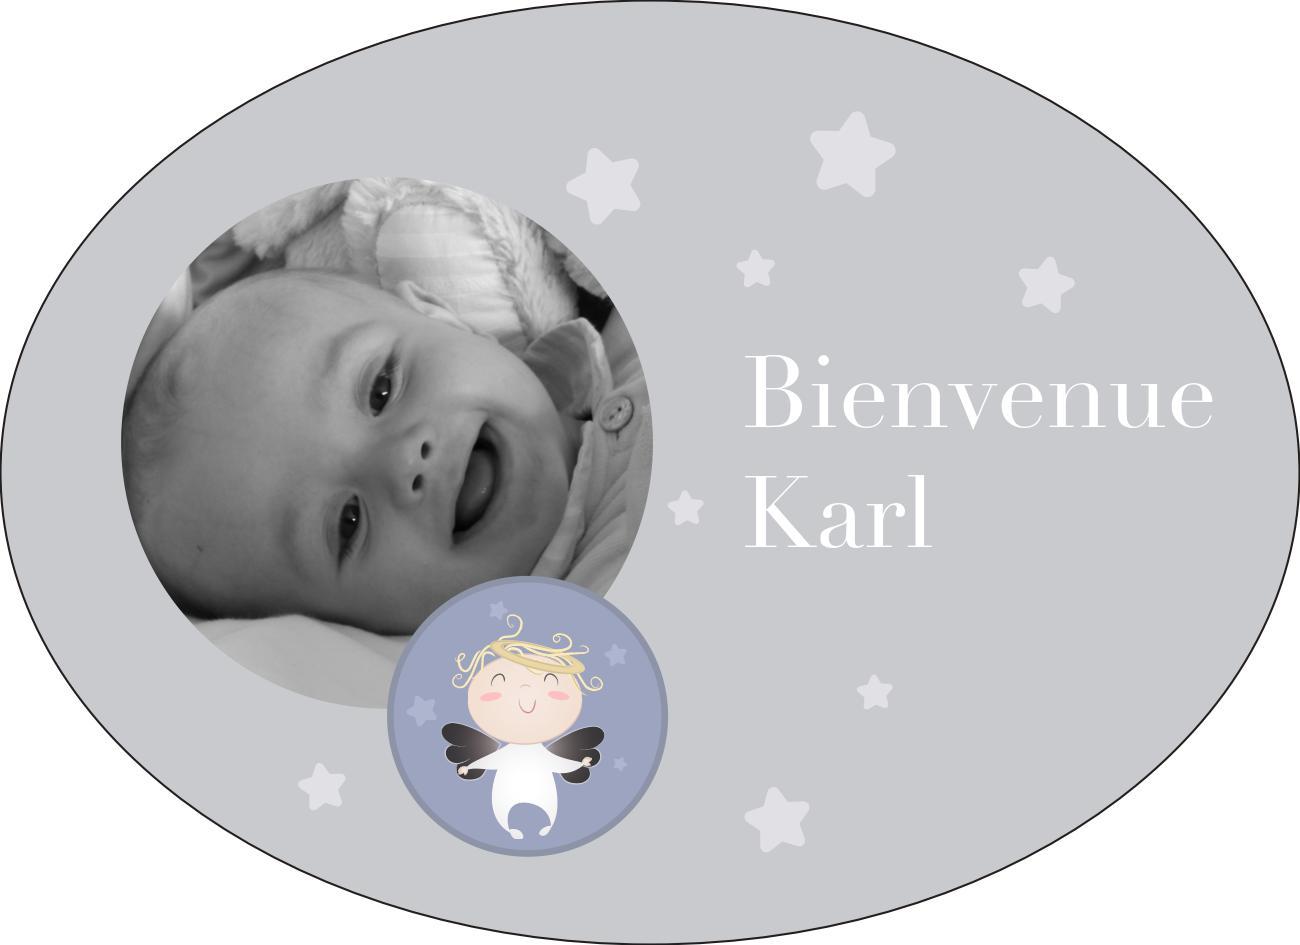 birth-karl-has_image